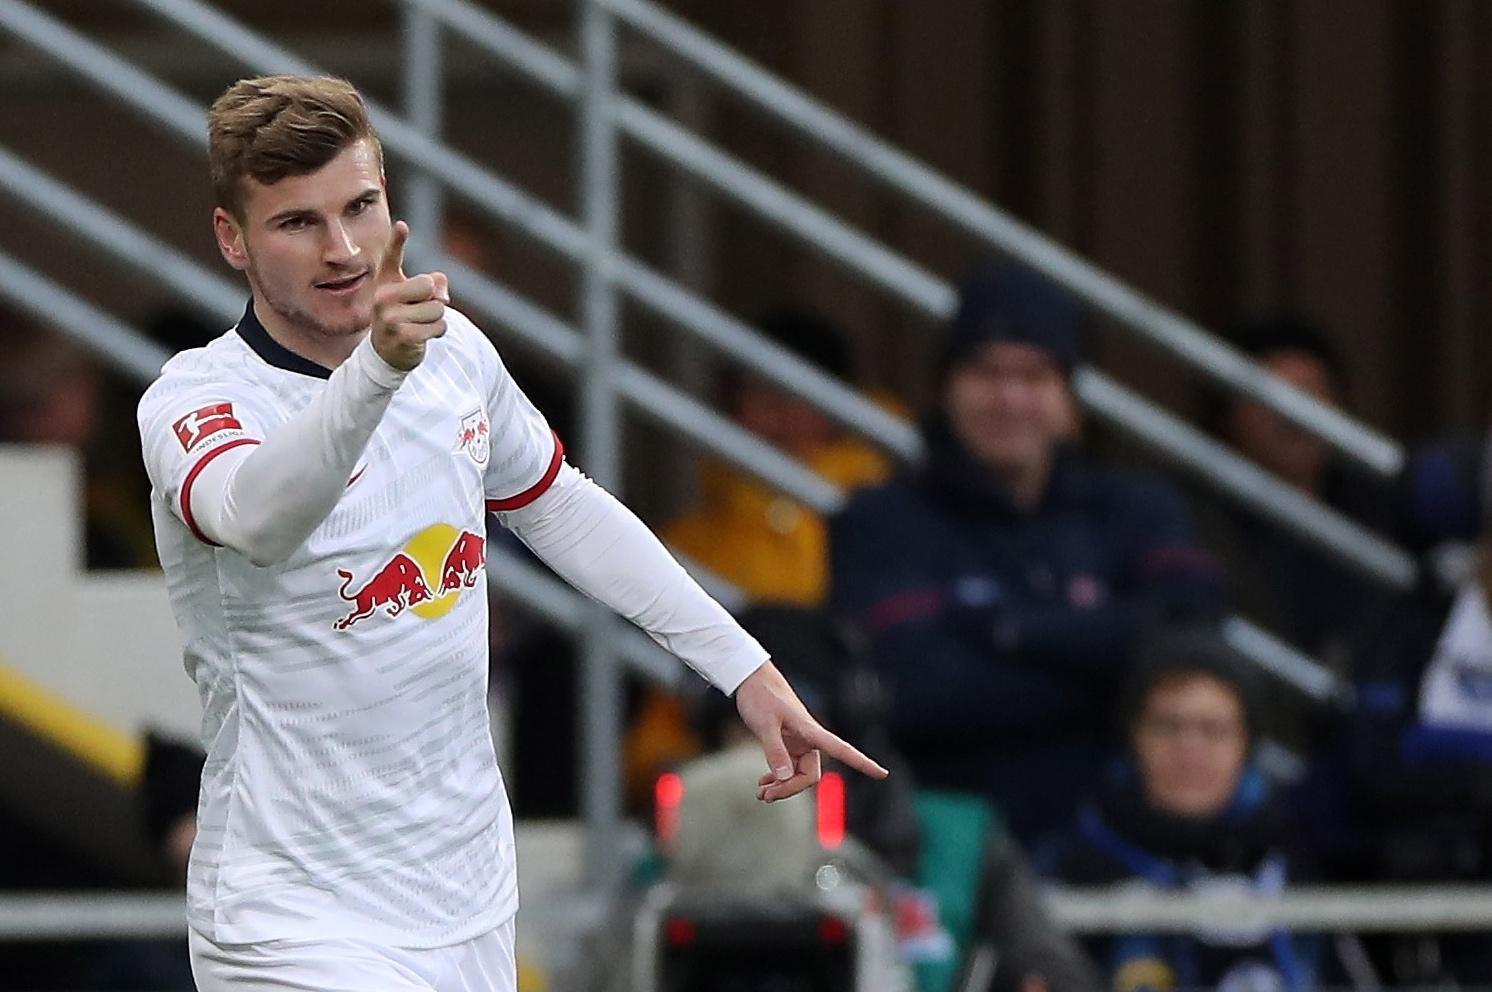 2. Timo Werner, Lipsia (20 gol, 40 punti)